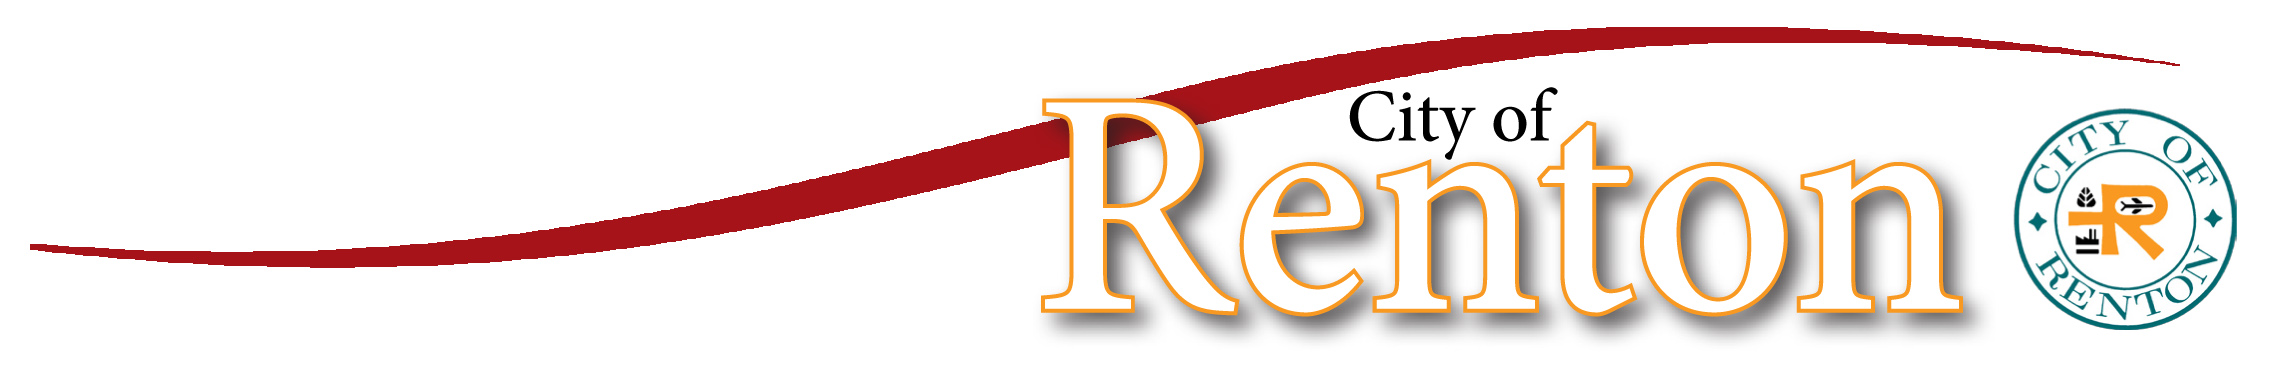 City of Renton Community Services